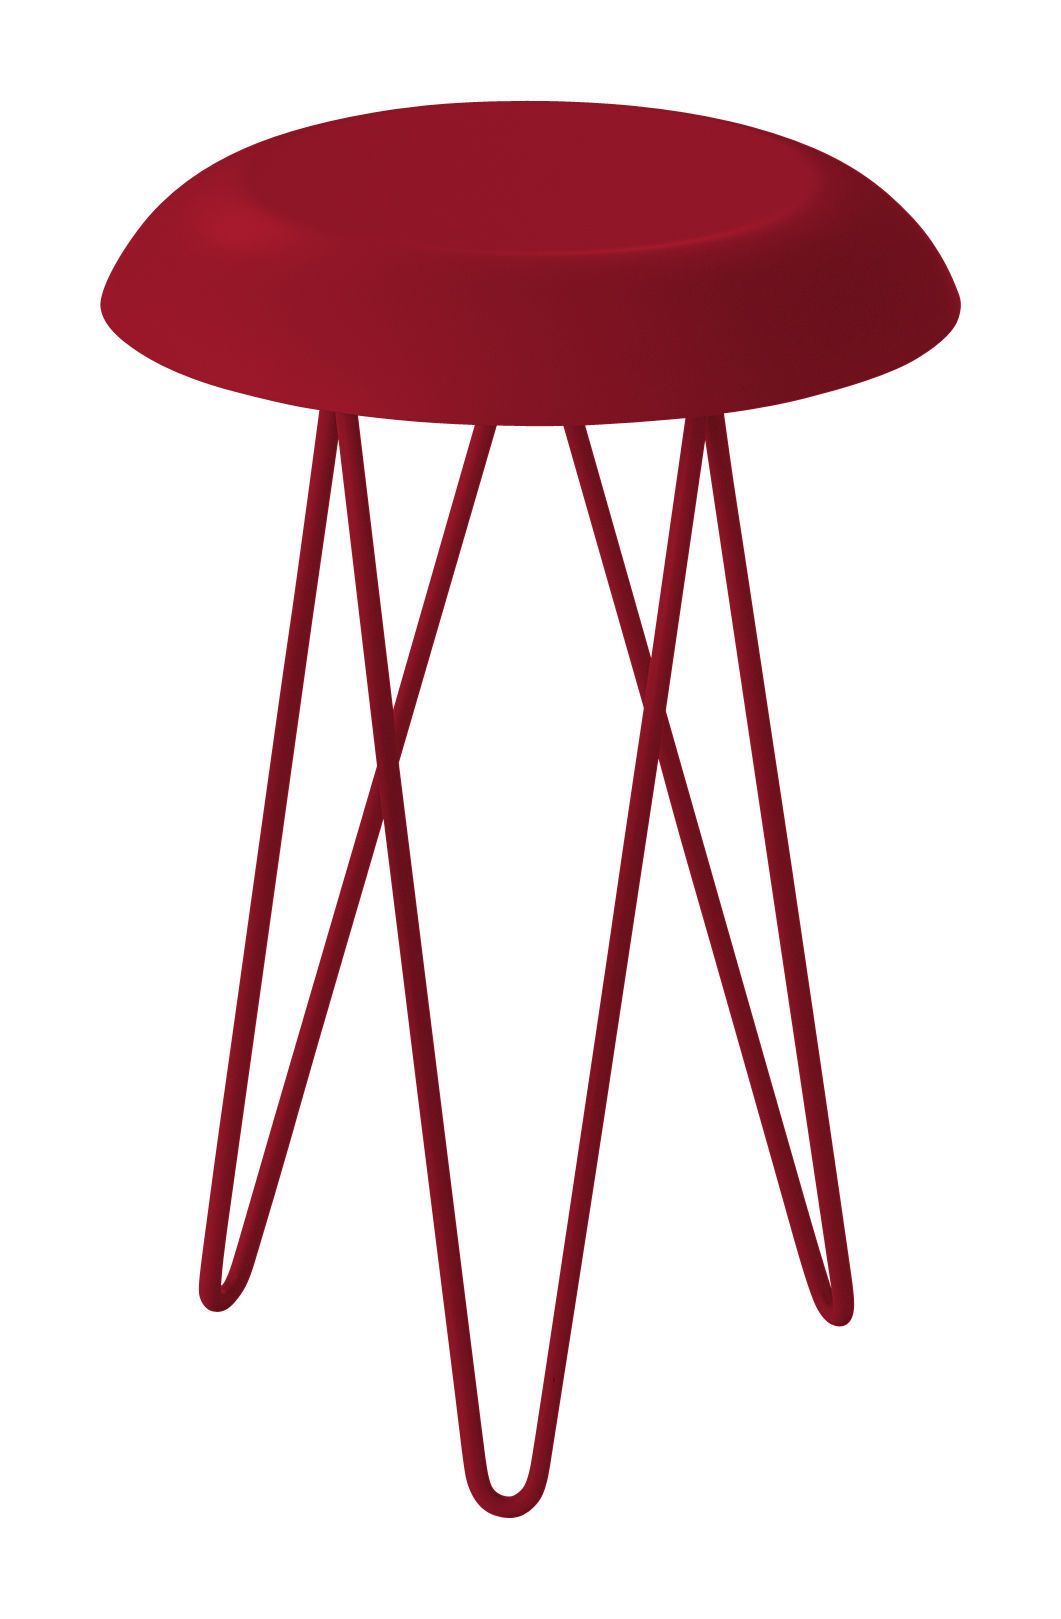 Furniture - Coffee Tables - Meduse End table - Ø 30 x H 44 cm by Casamania - Burgundy - Varnished metal, Varnished stainless steel